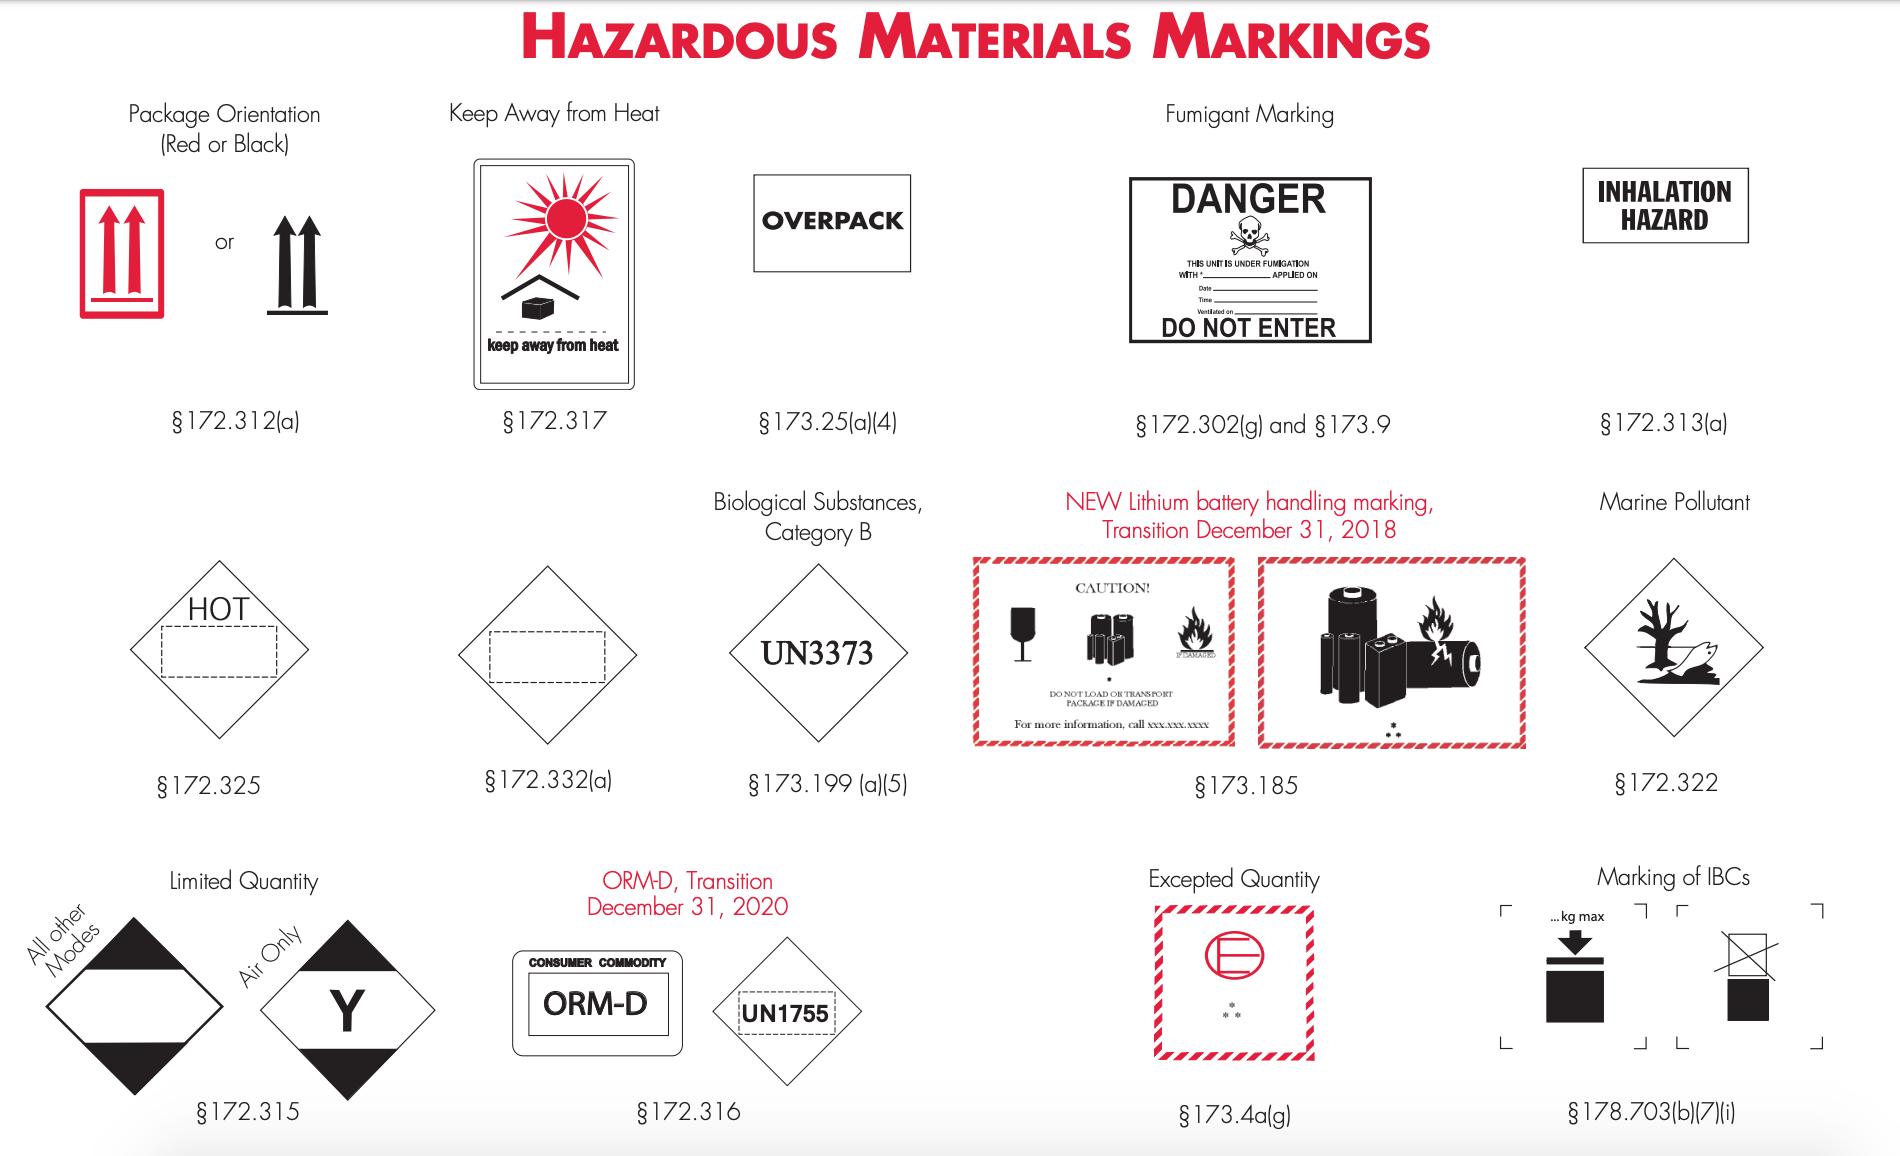 HAZMAT markings